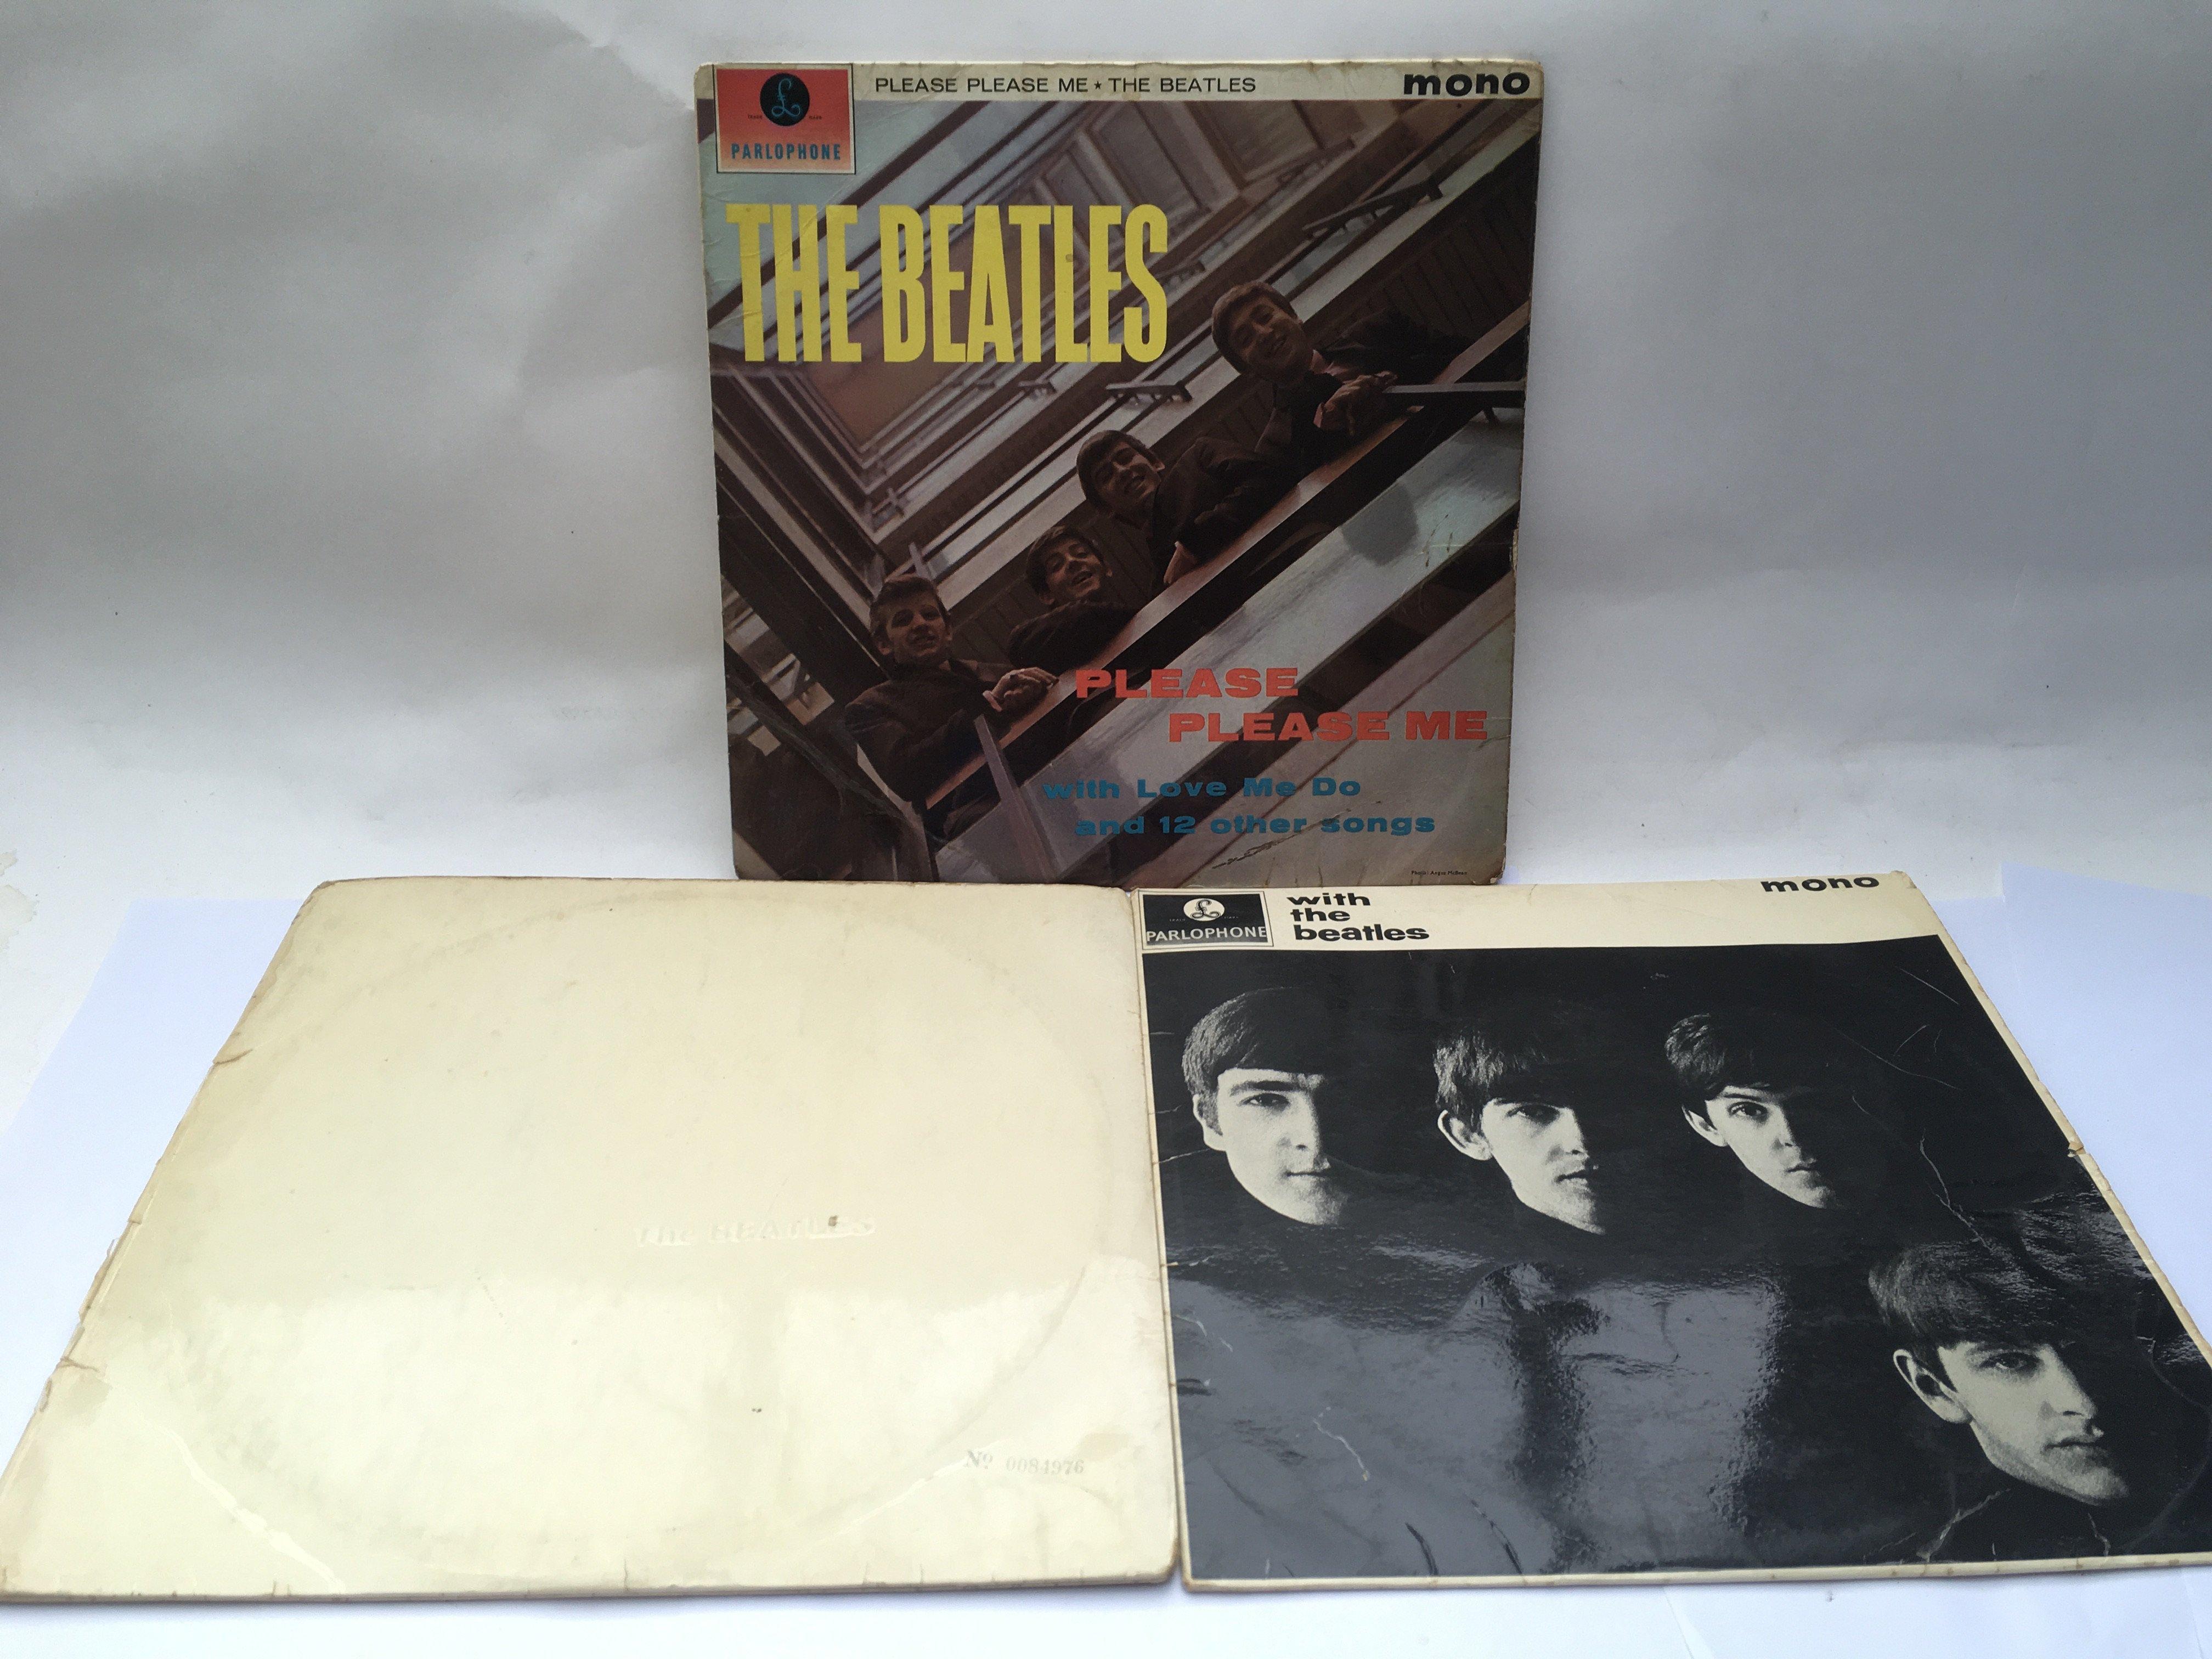 Three early UK pressings of Beatles LPs comprising